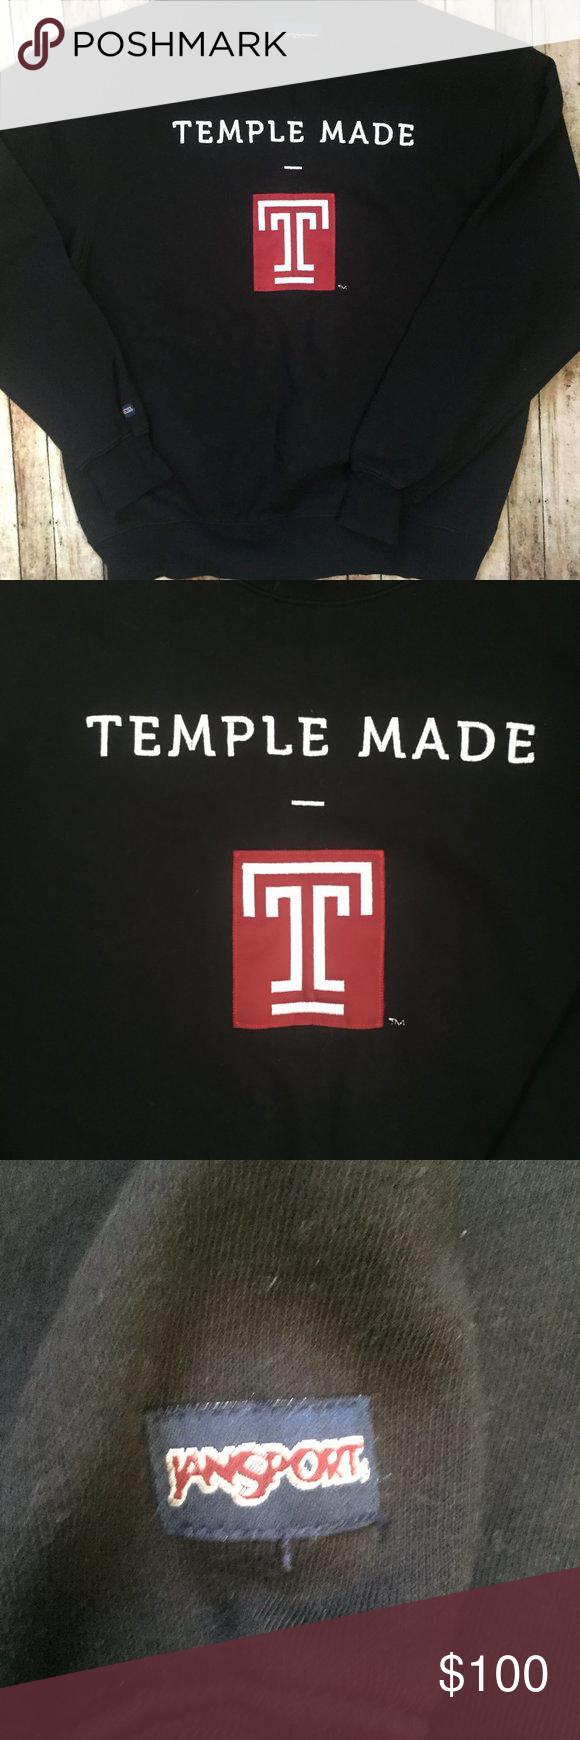 Vintage Temple University Jansport Sweatshirt University Sweatshirts Vintage Sweatshirt Sweatshirts [ 1740 x 580 Pixel ]